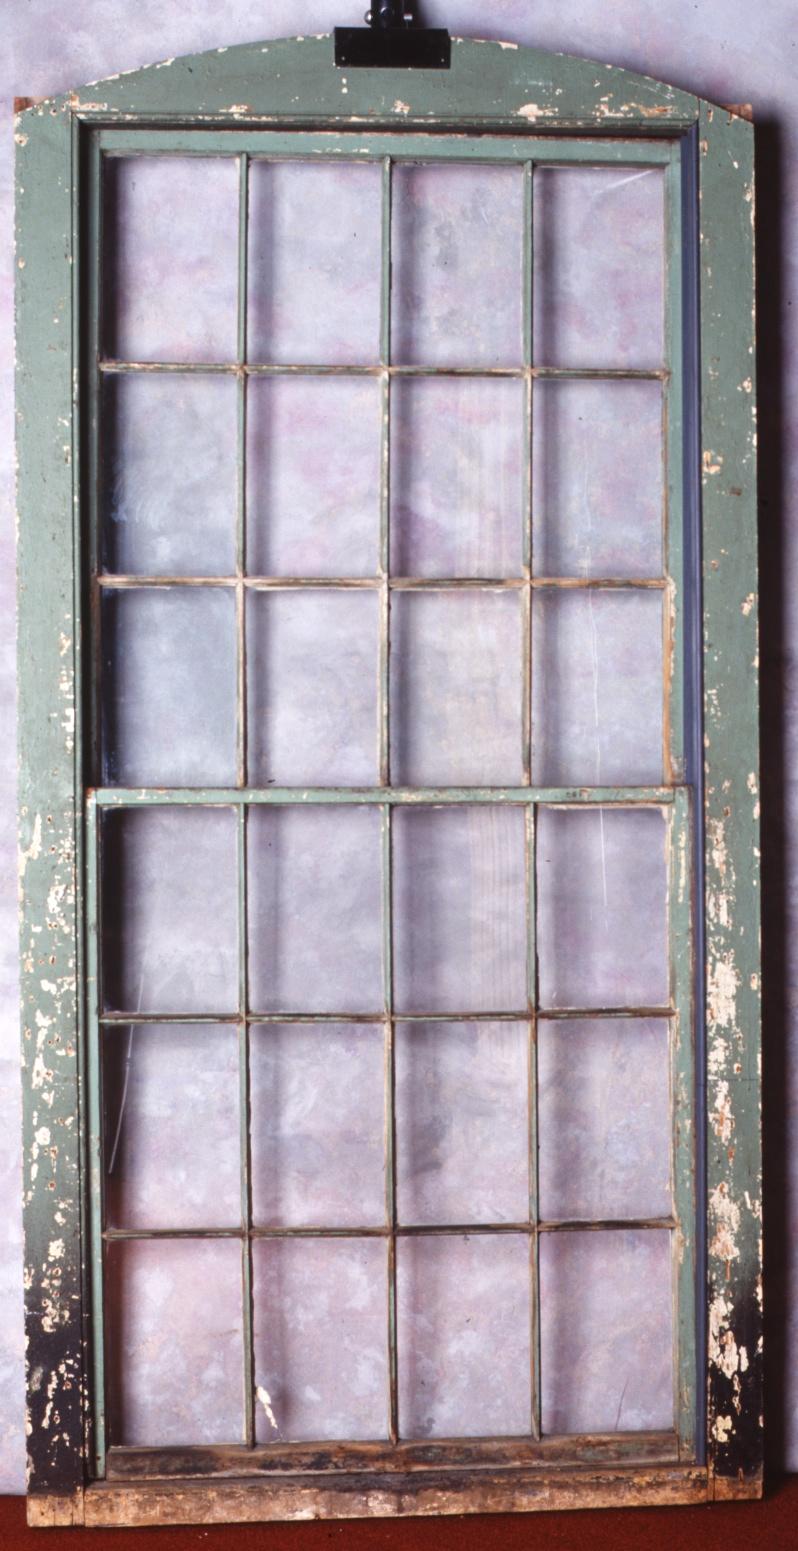 1870-industrial-window3